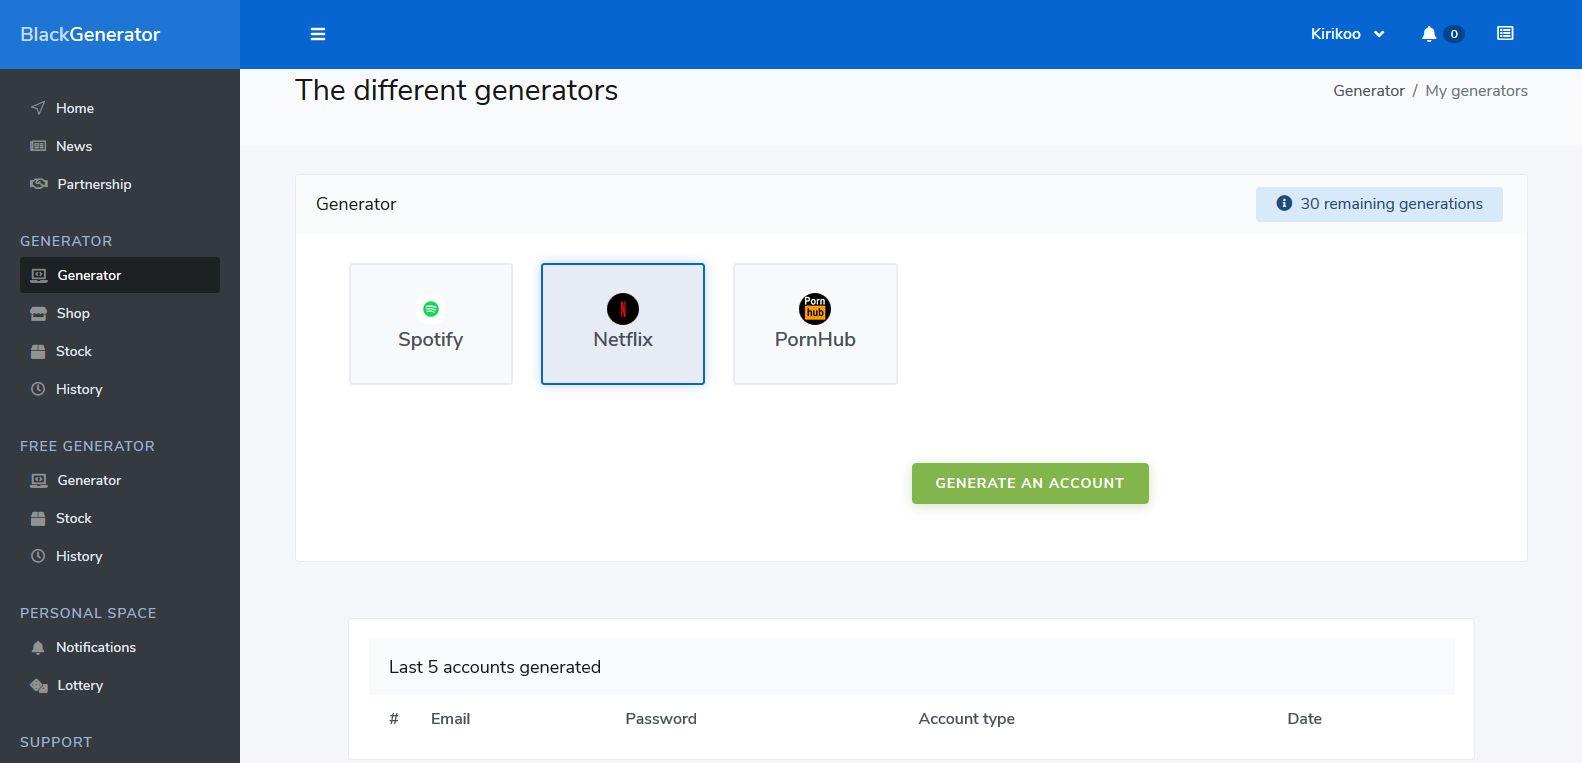 BlackGenerator - Account Generator Template